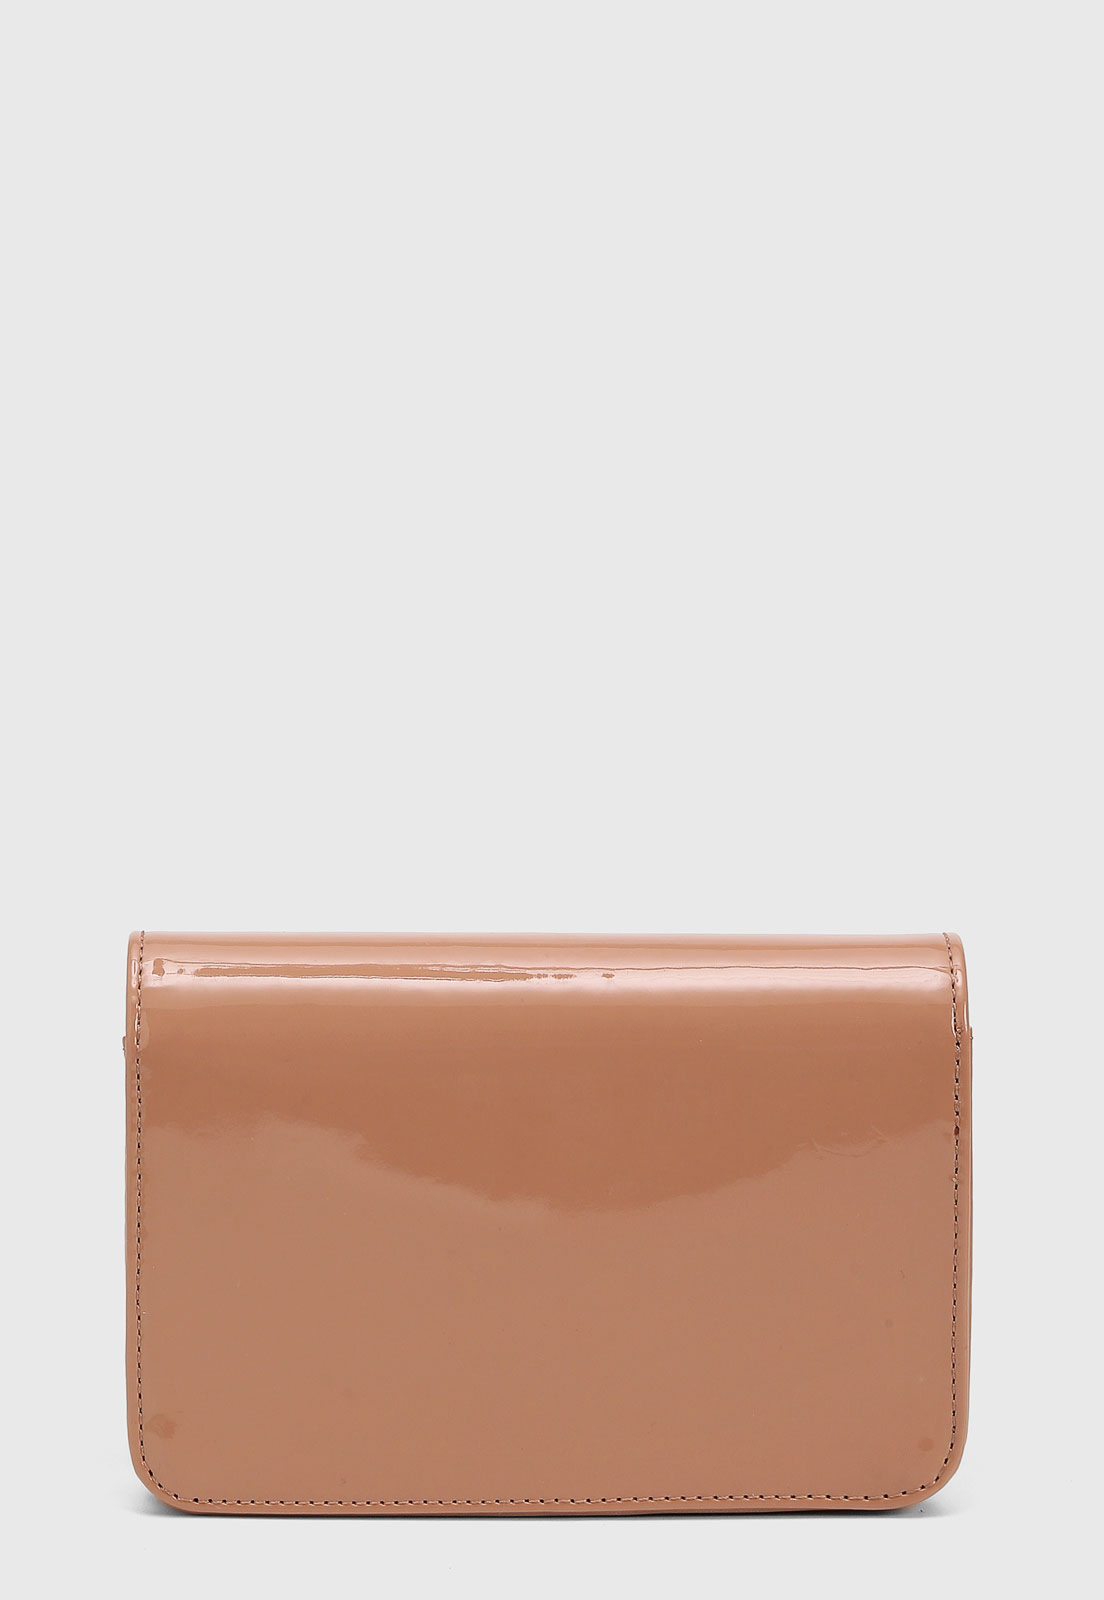 Bolsa Santa Lolla Verniz Nude Pequena